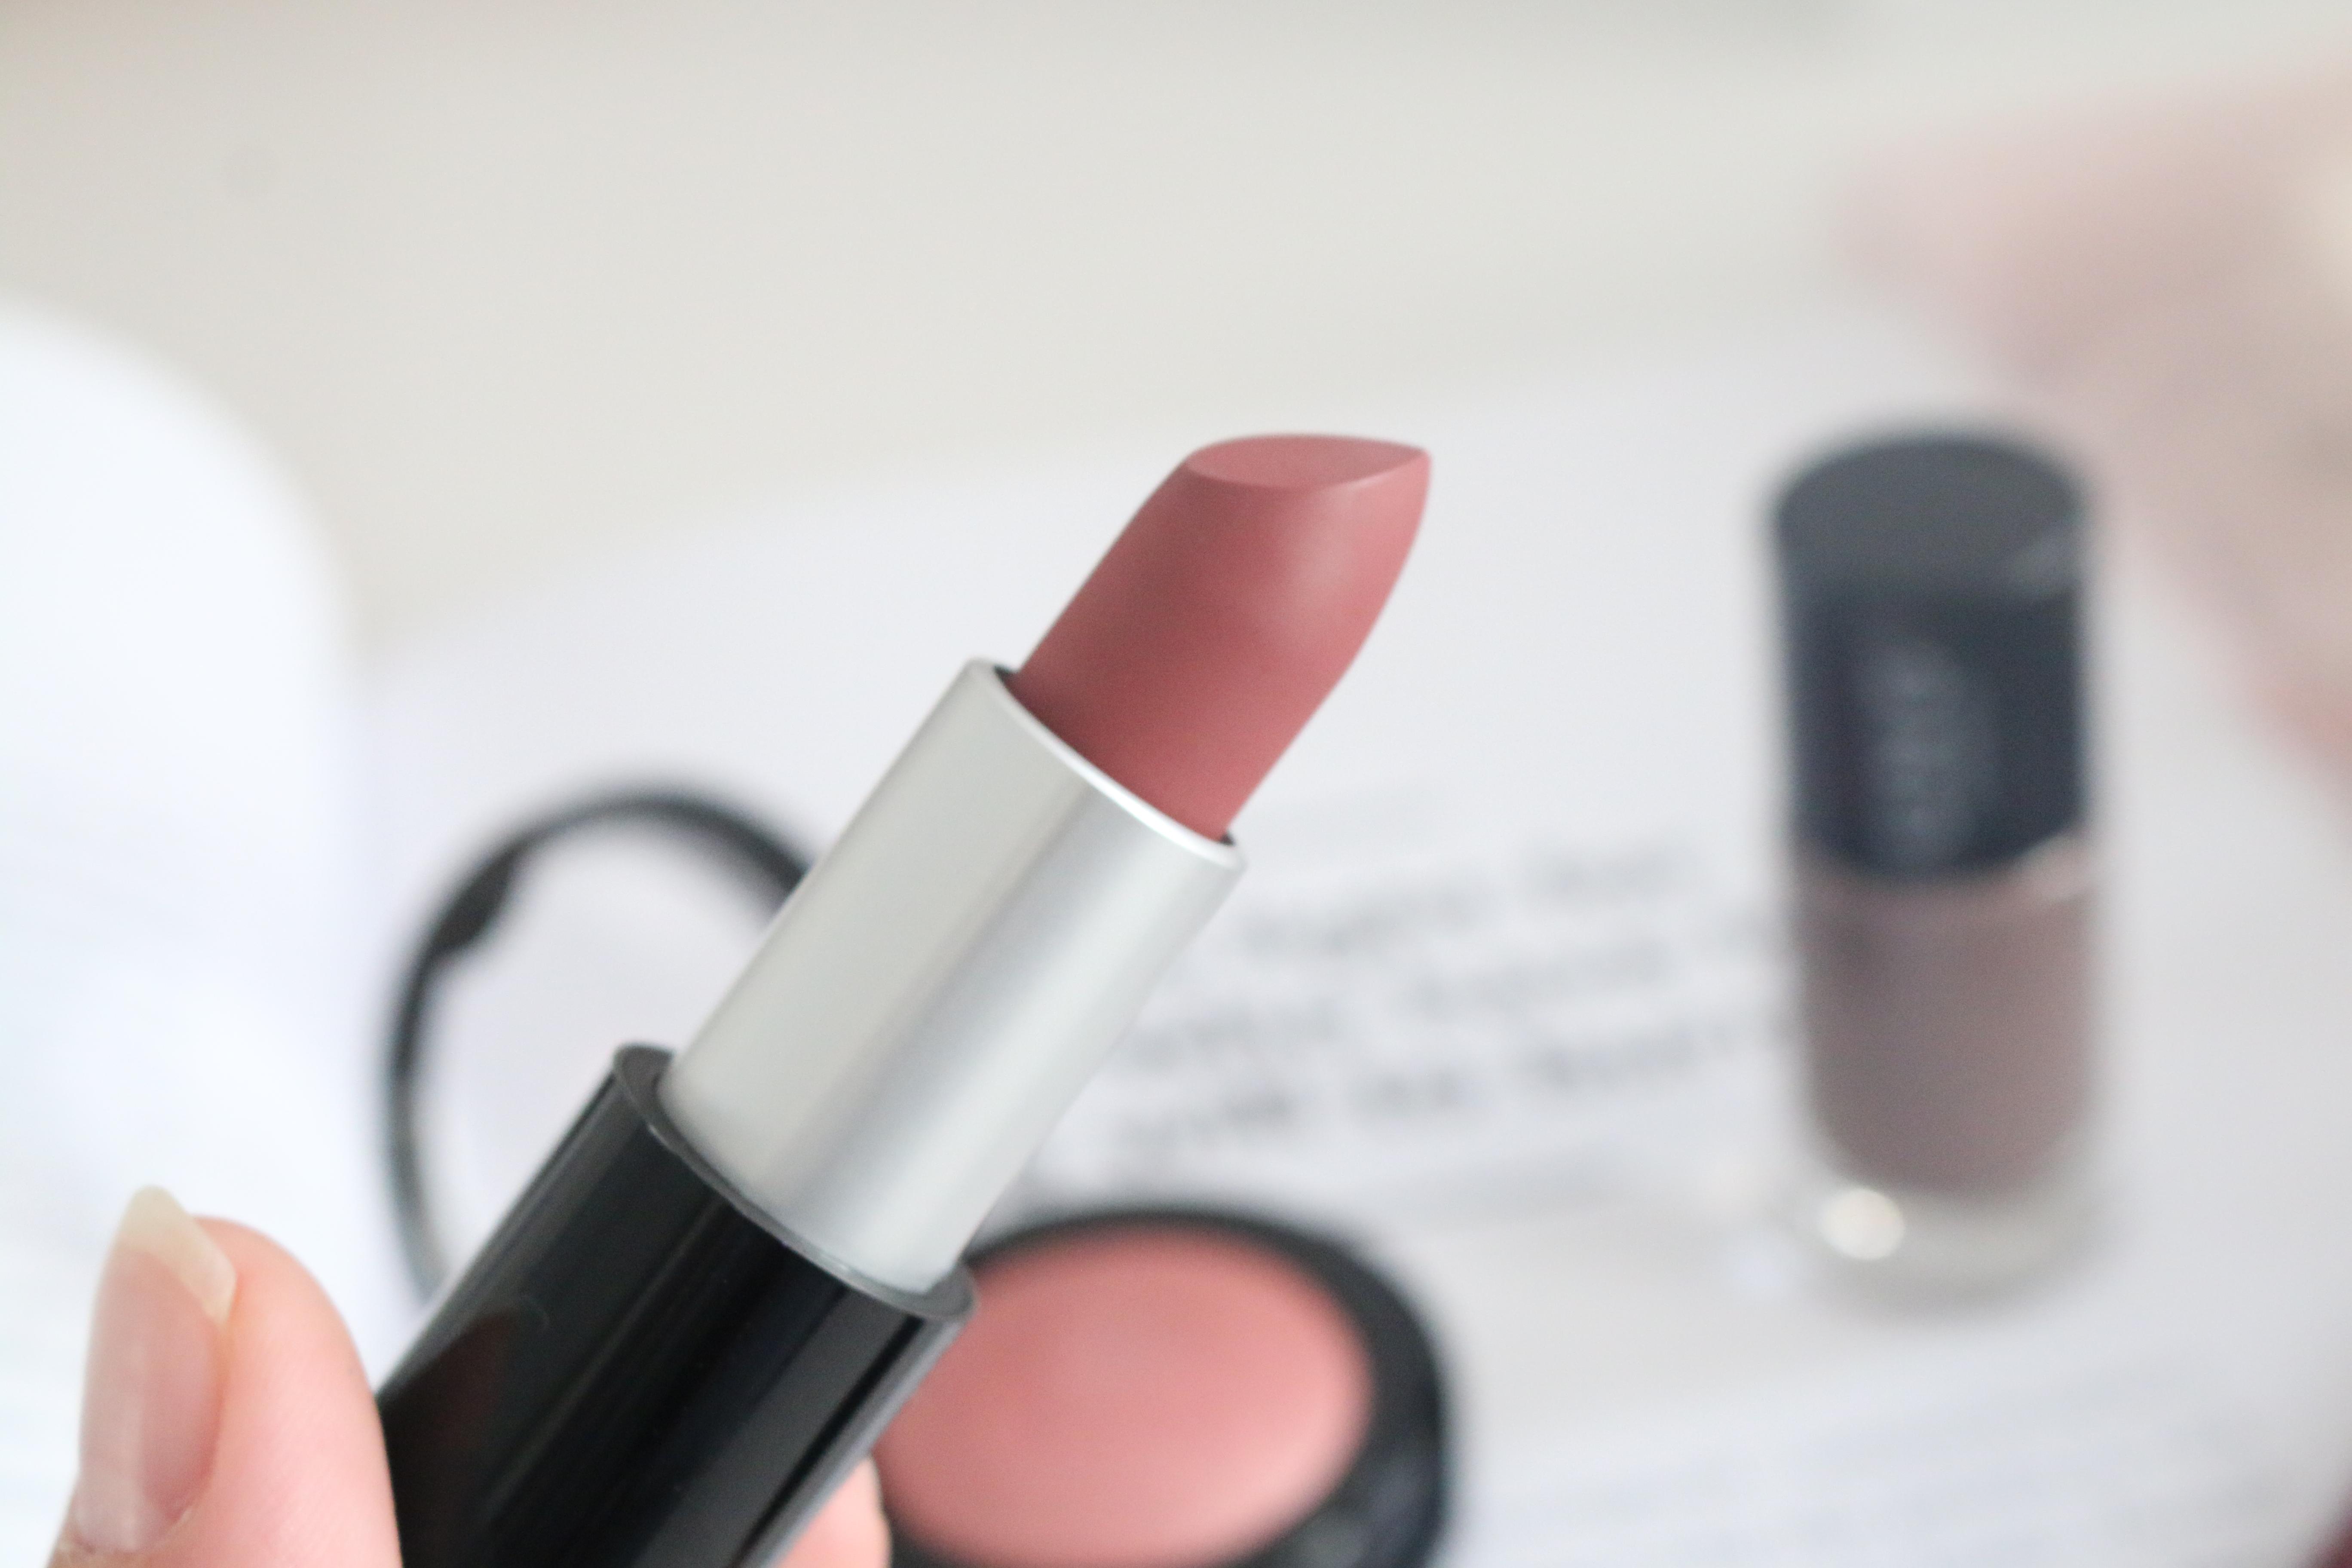 UNG Cosmetics Velvet Lipstick Chestnut